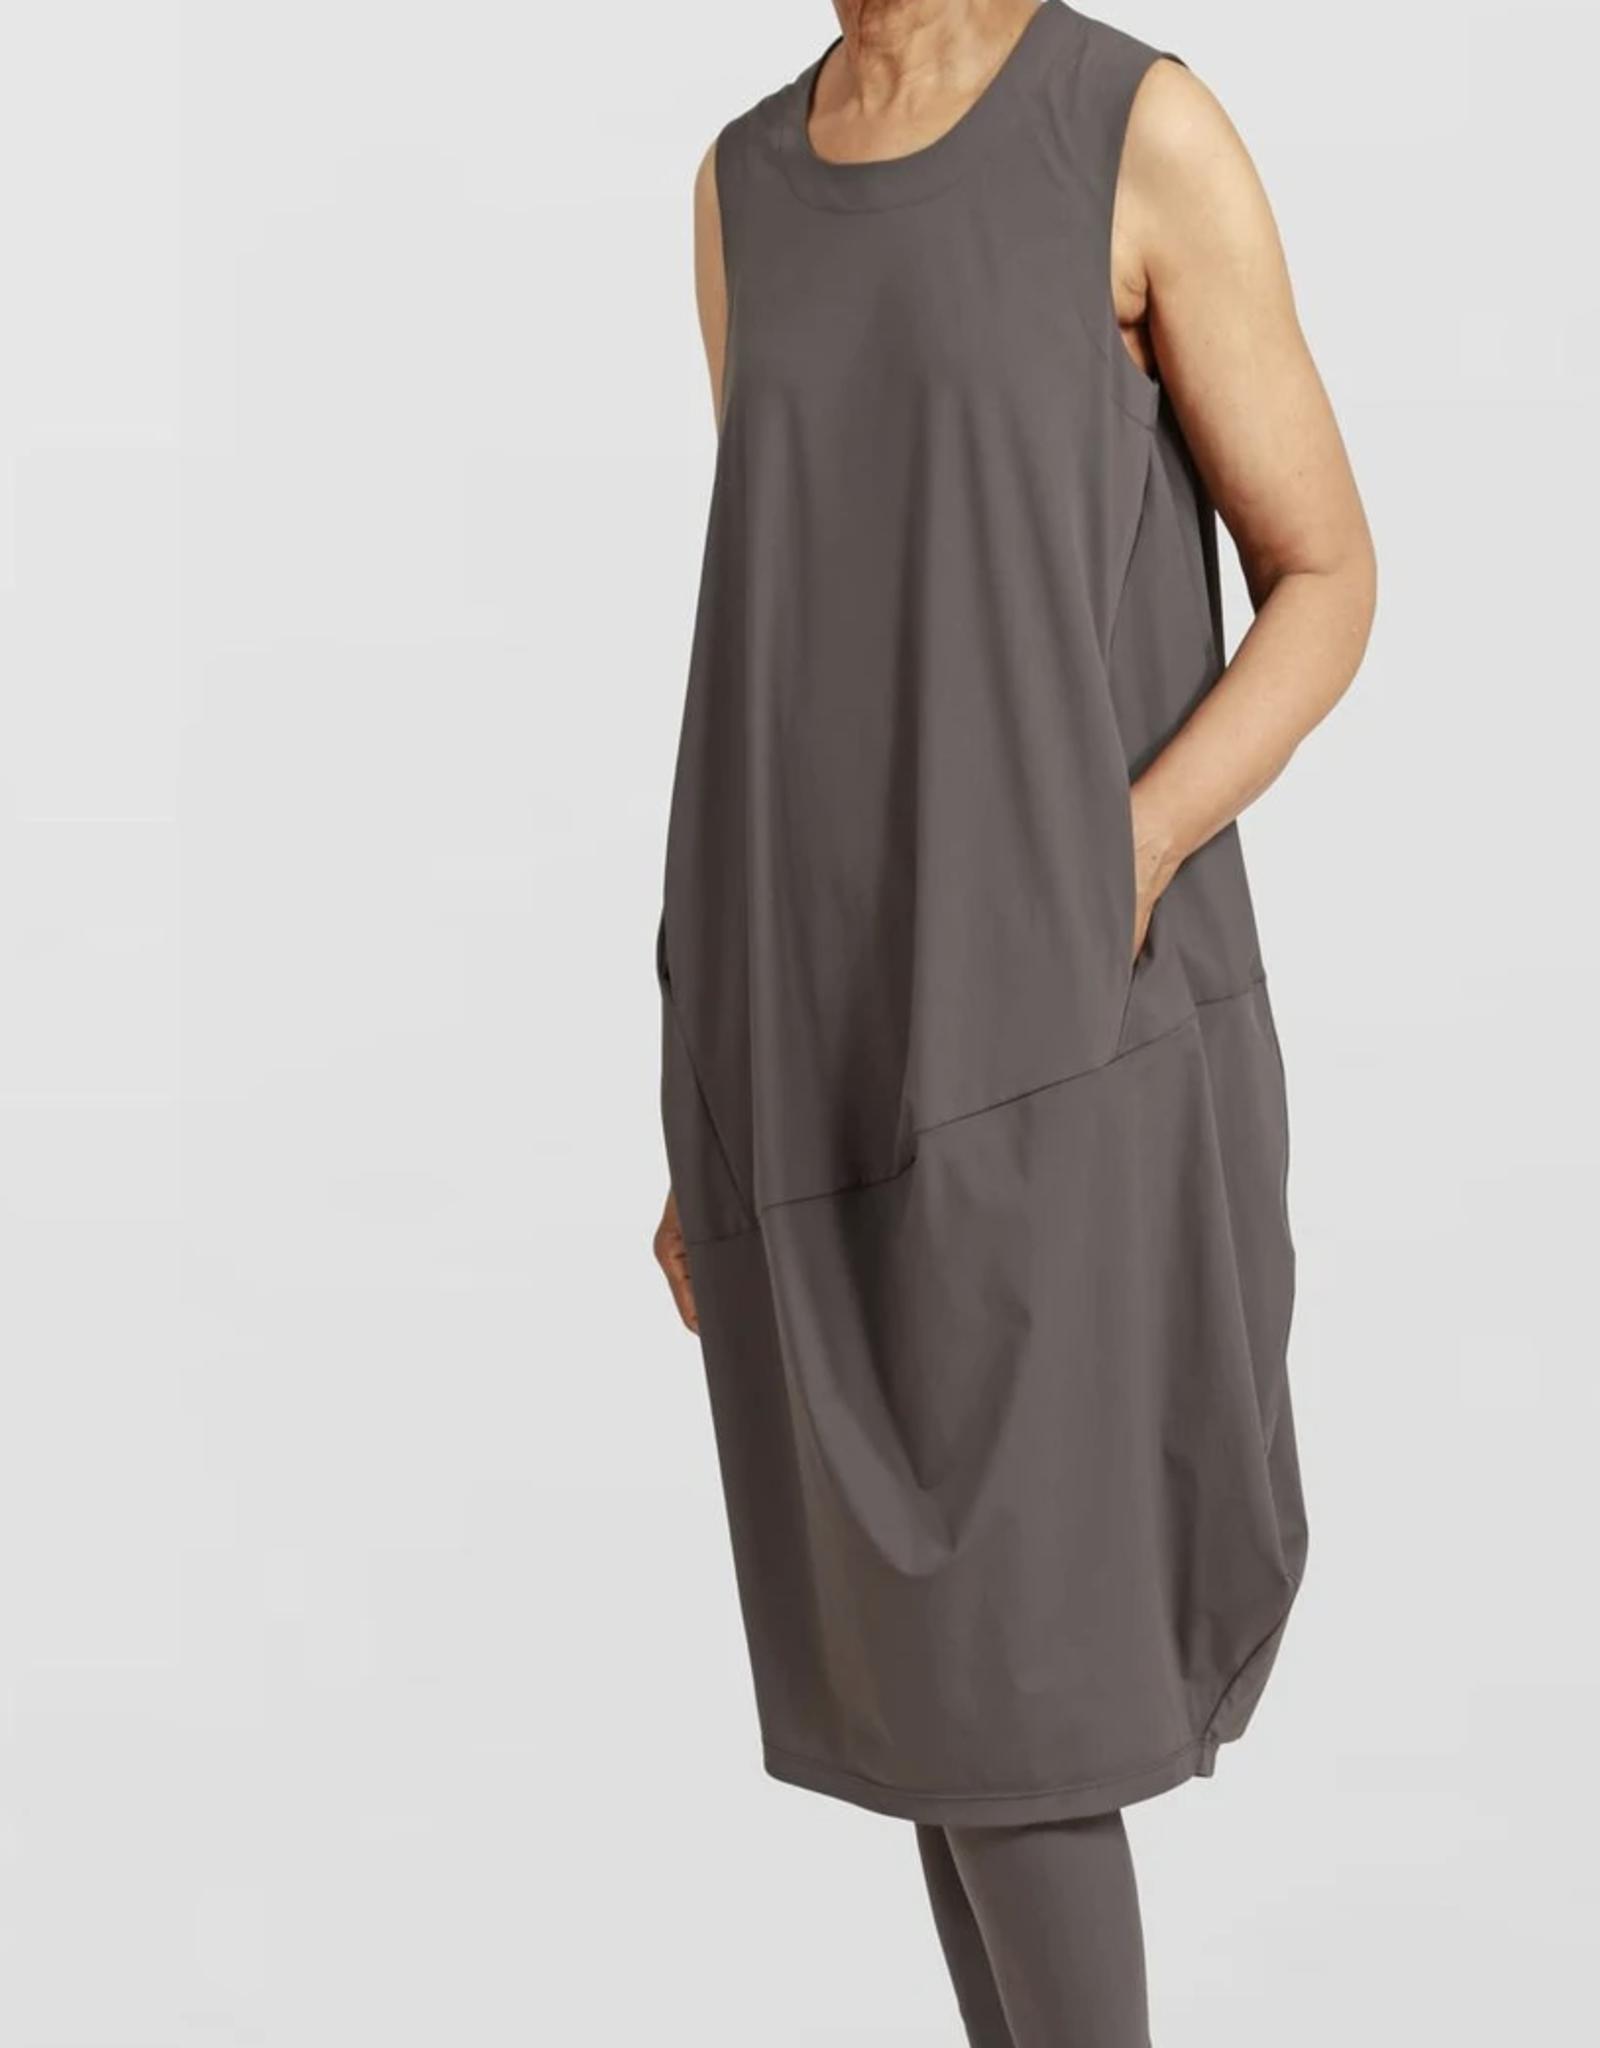 Ayrtight Ayrtight Index Yara Dress